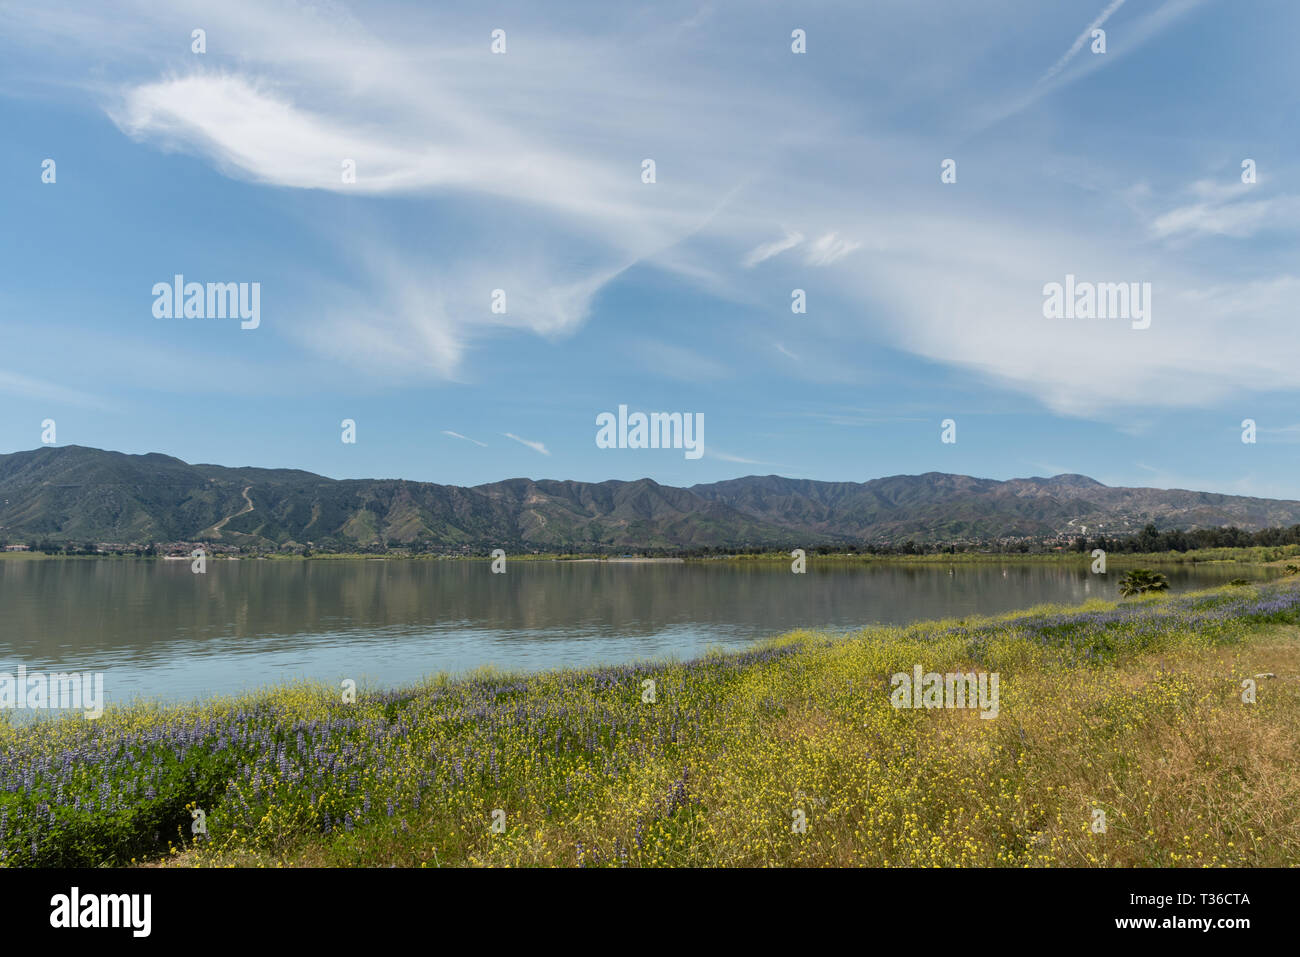 Beautiful Lake Elsinore vista in springtime, Southern California - Stock Image